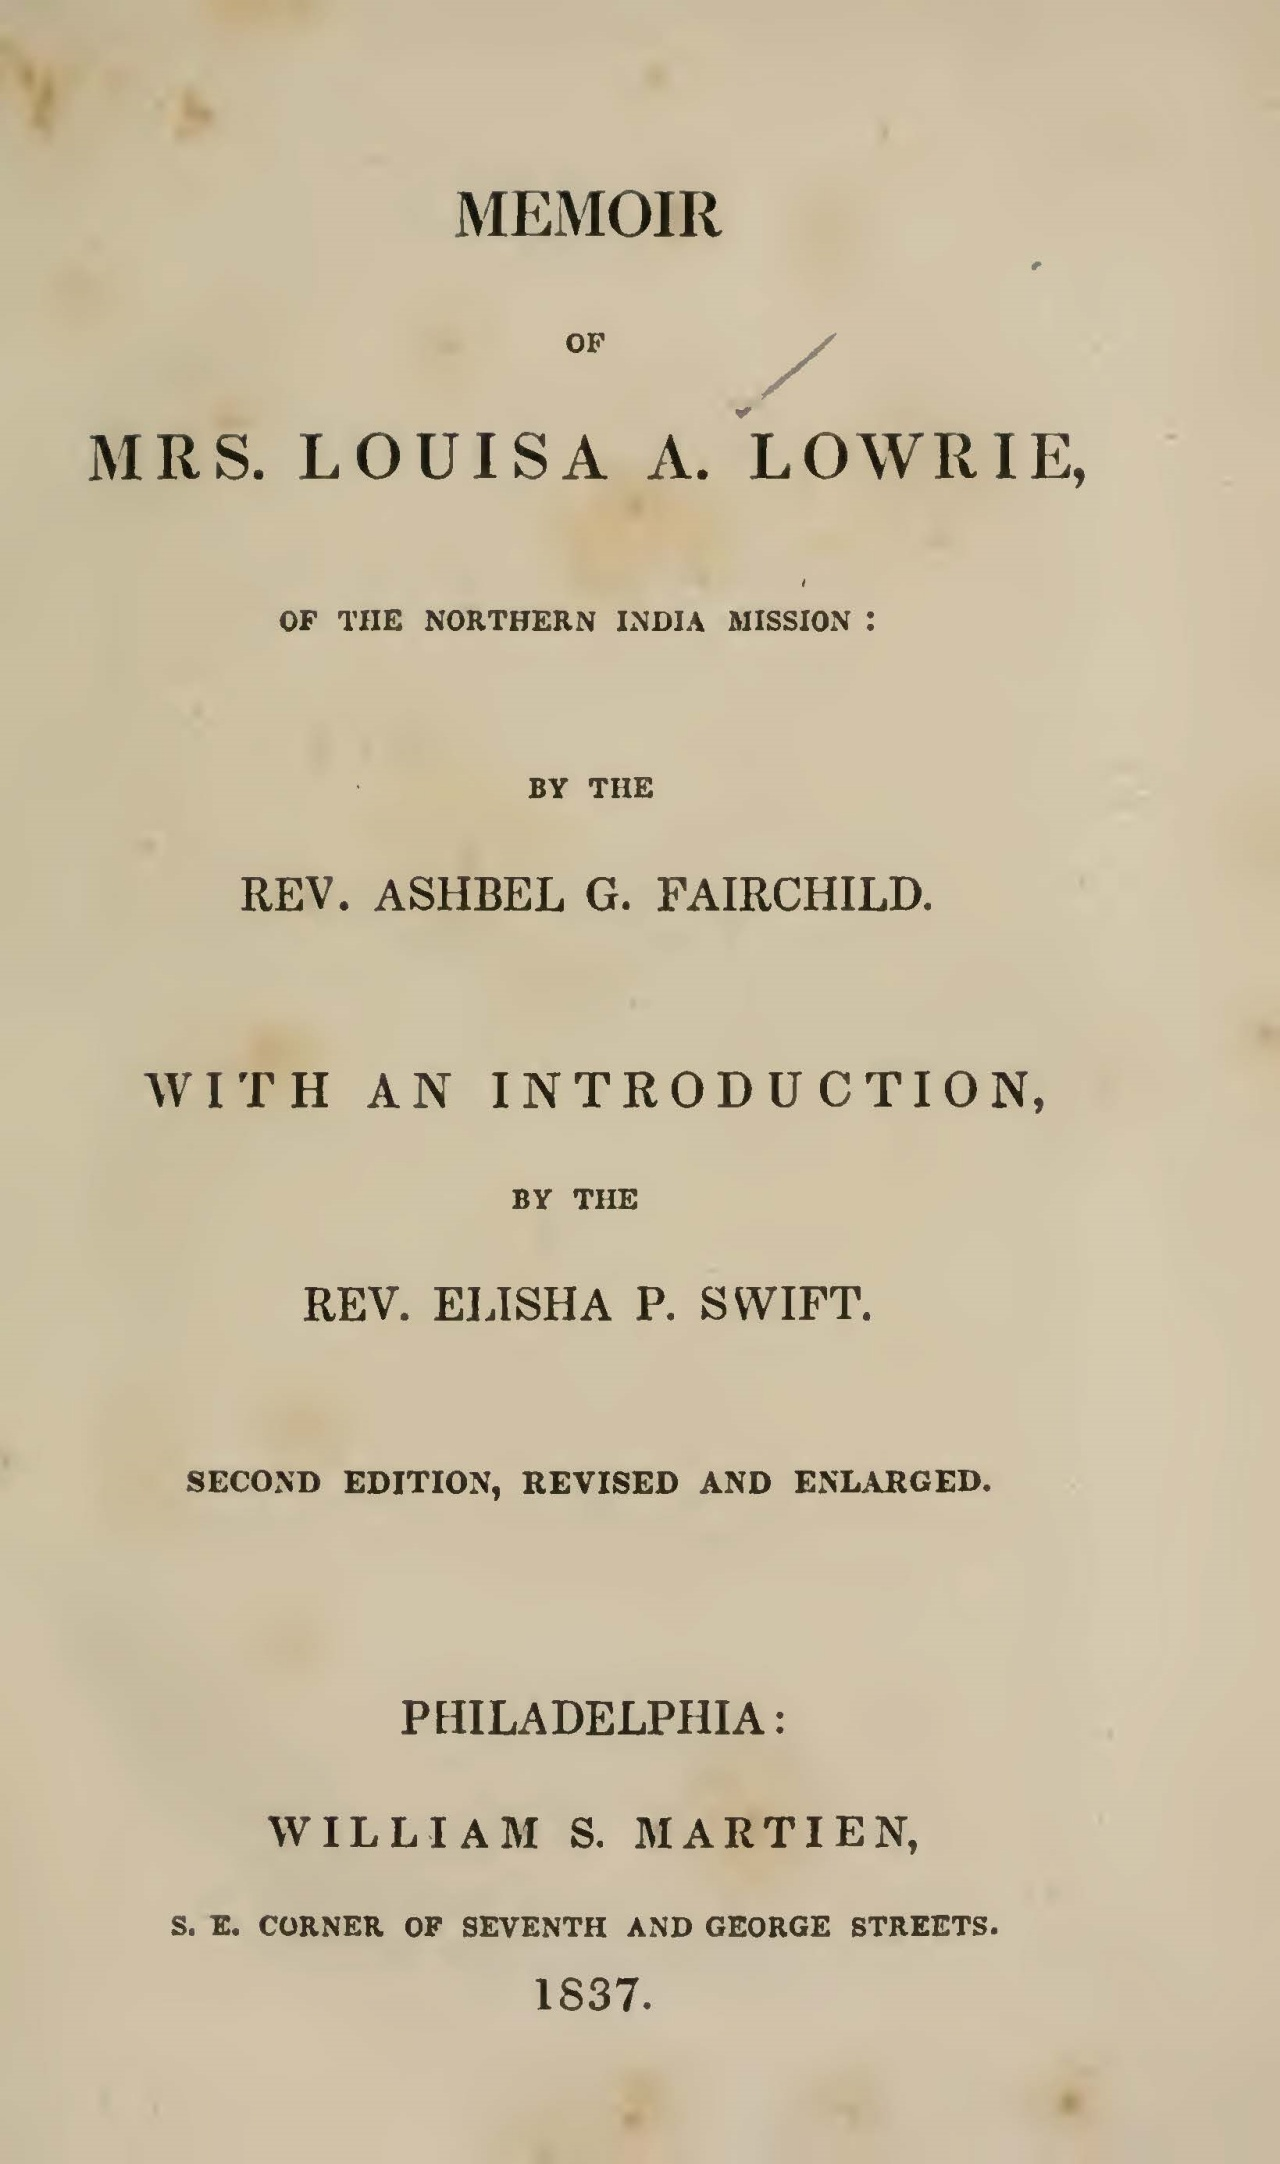 Fairchild, Ashbel Green, Memoir of Mrs. Louisa A. Lowrie Title Page.jpg